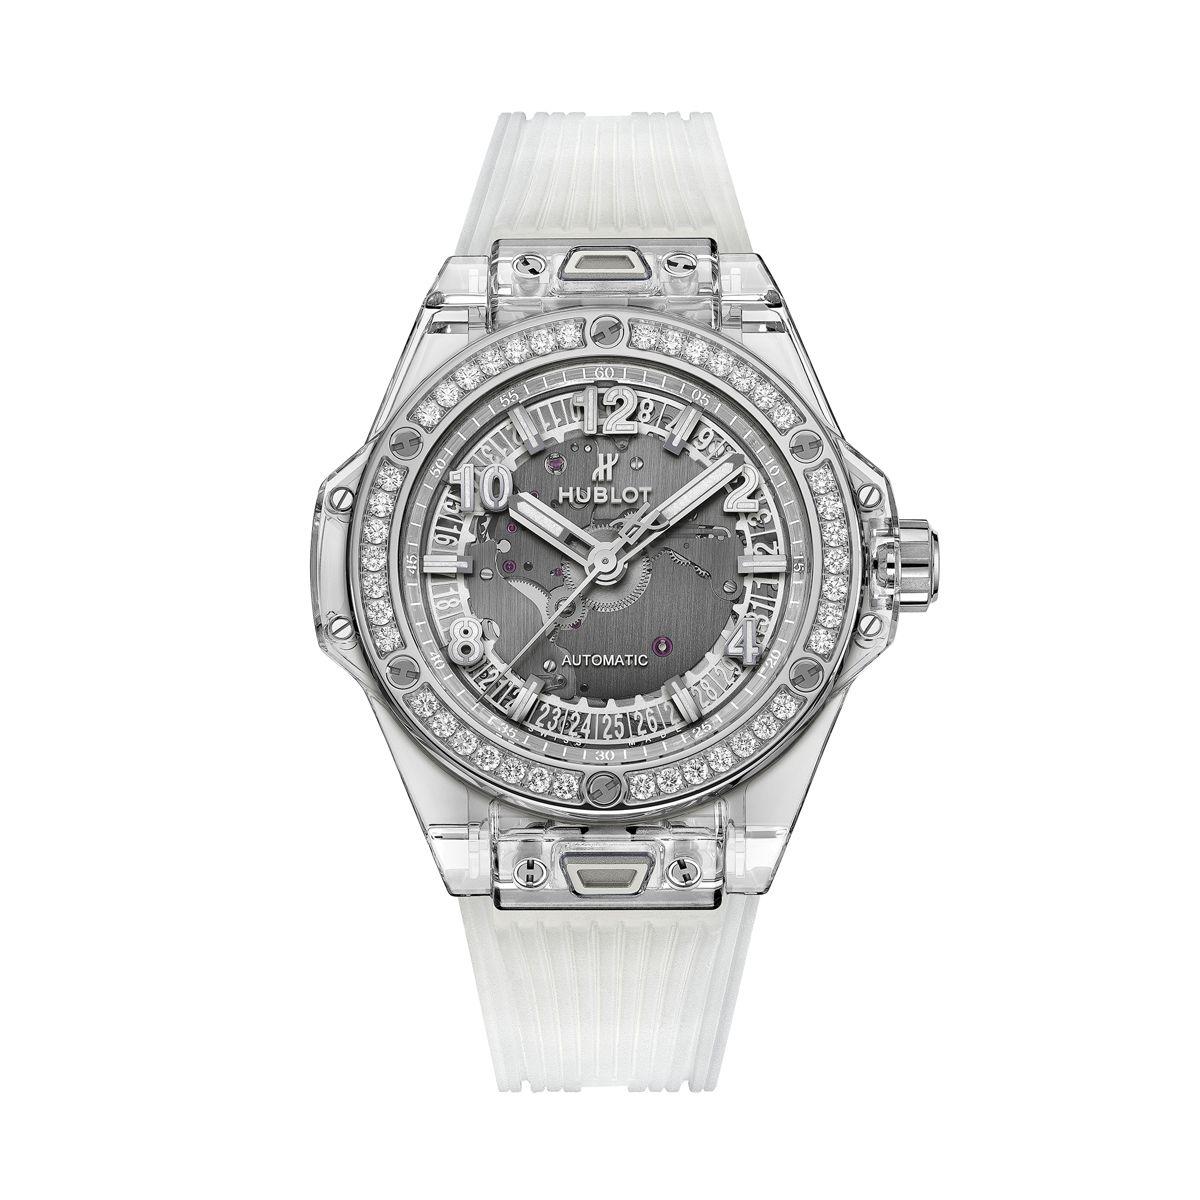 Hublot-Big-Bang- One-Click-Sapphire-relojes-mujer-2018-10